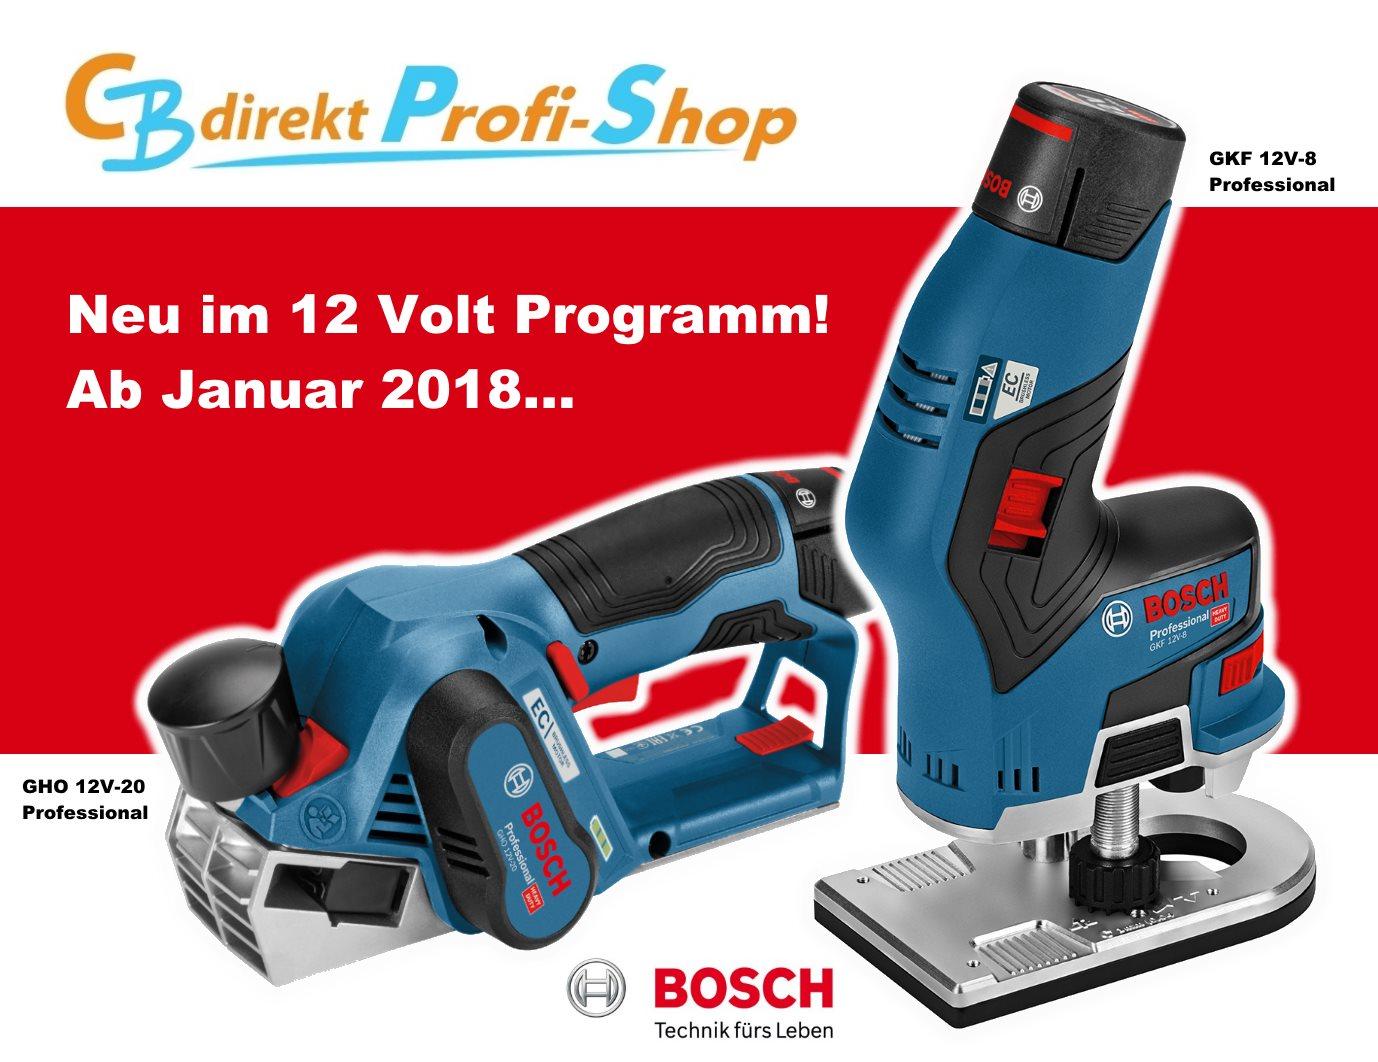 Bosch Akku Kantenfräse GKF 12V-8 und Akku-Hobel 12V-20 neu ab Januar 2018